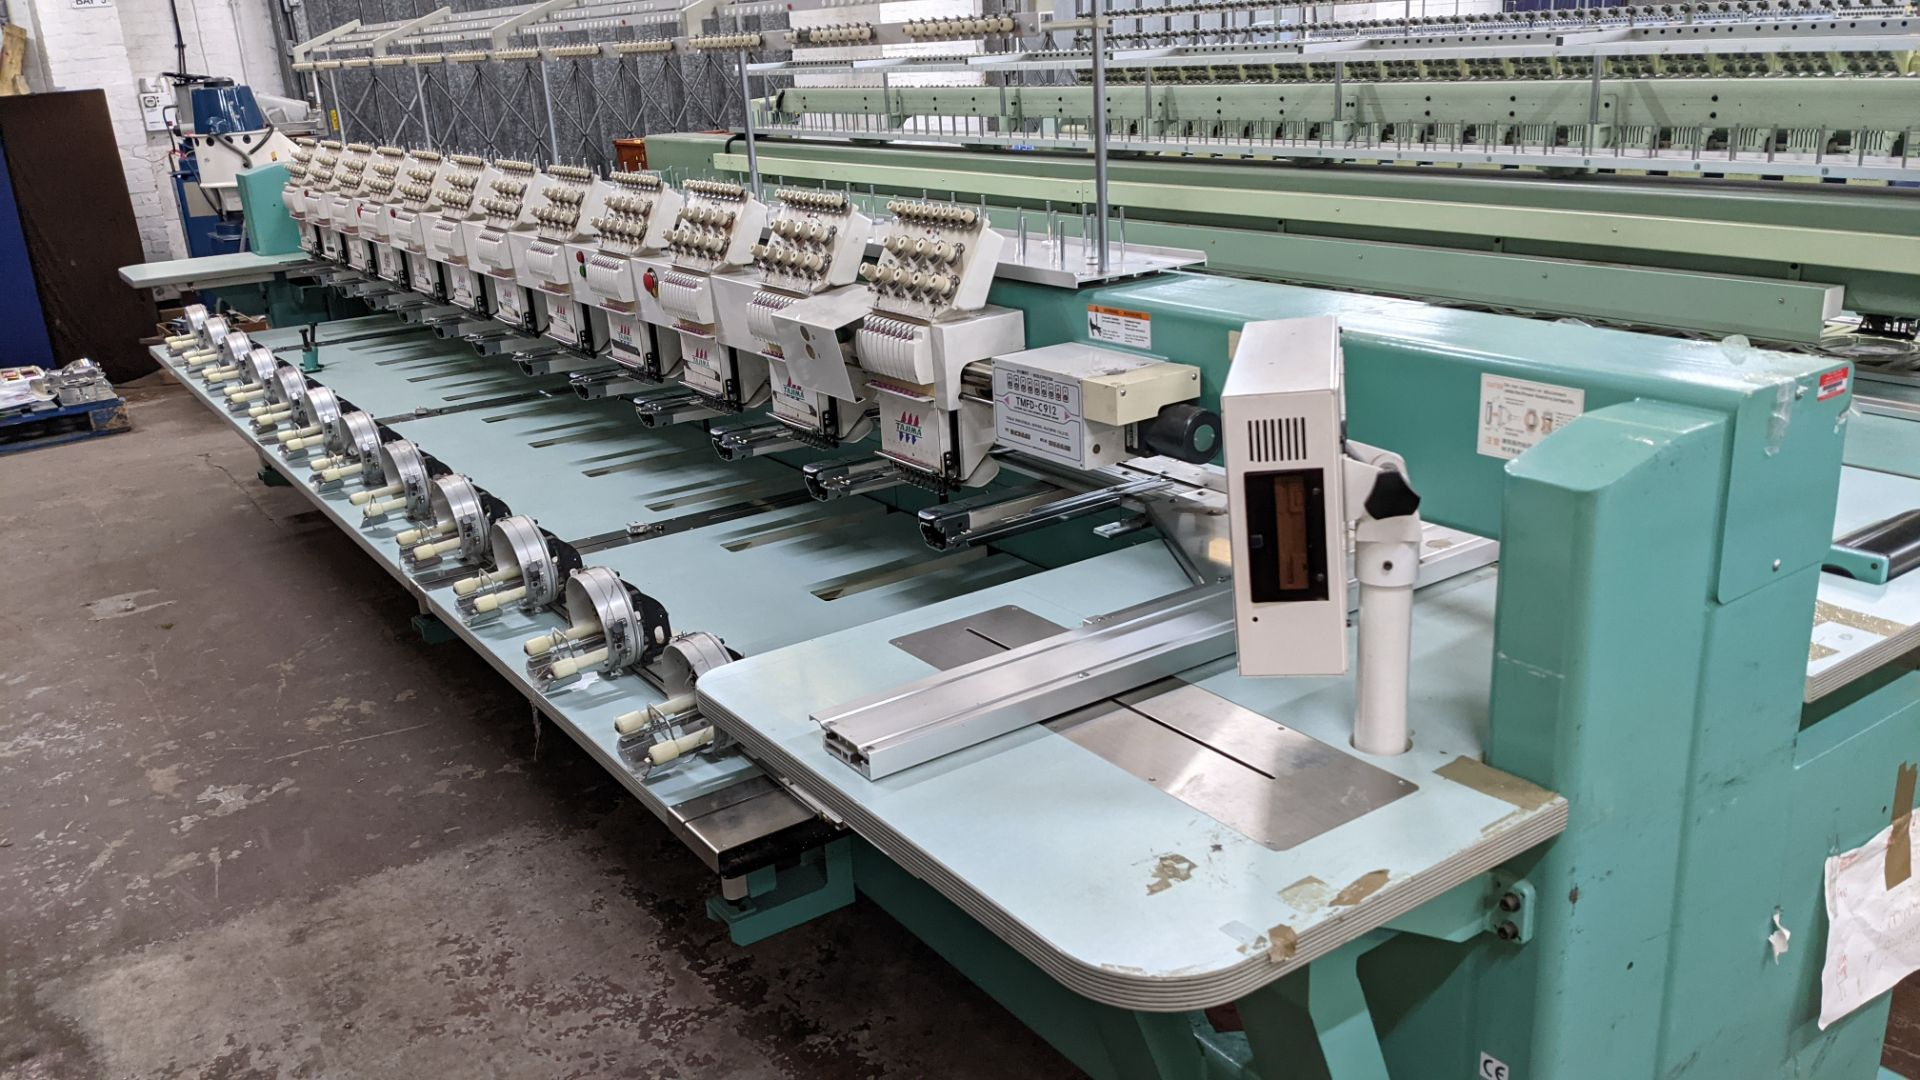 Tokai Tajima model TMFD-C912 electronic 12 head embroidery machine, type 2-2FX - Image 11 of 27